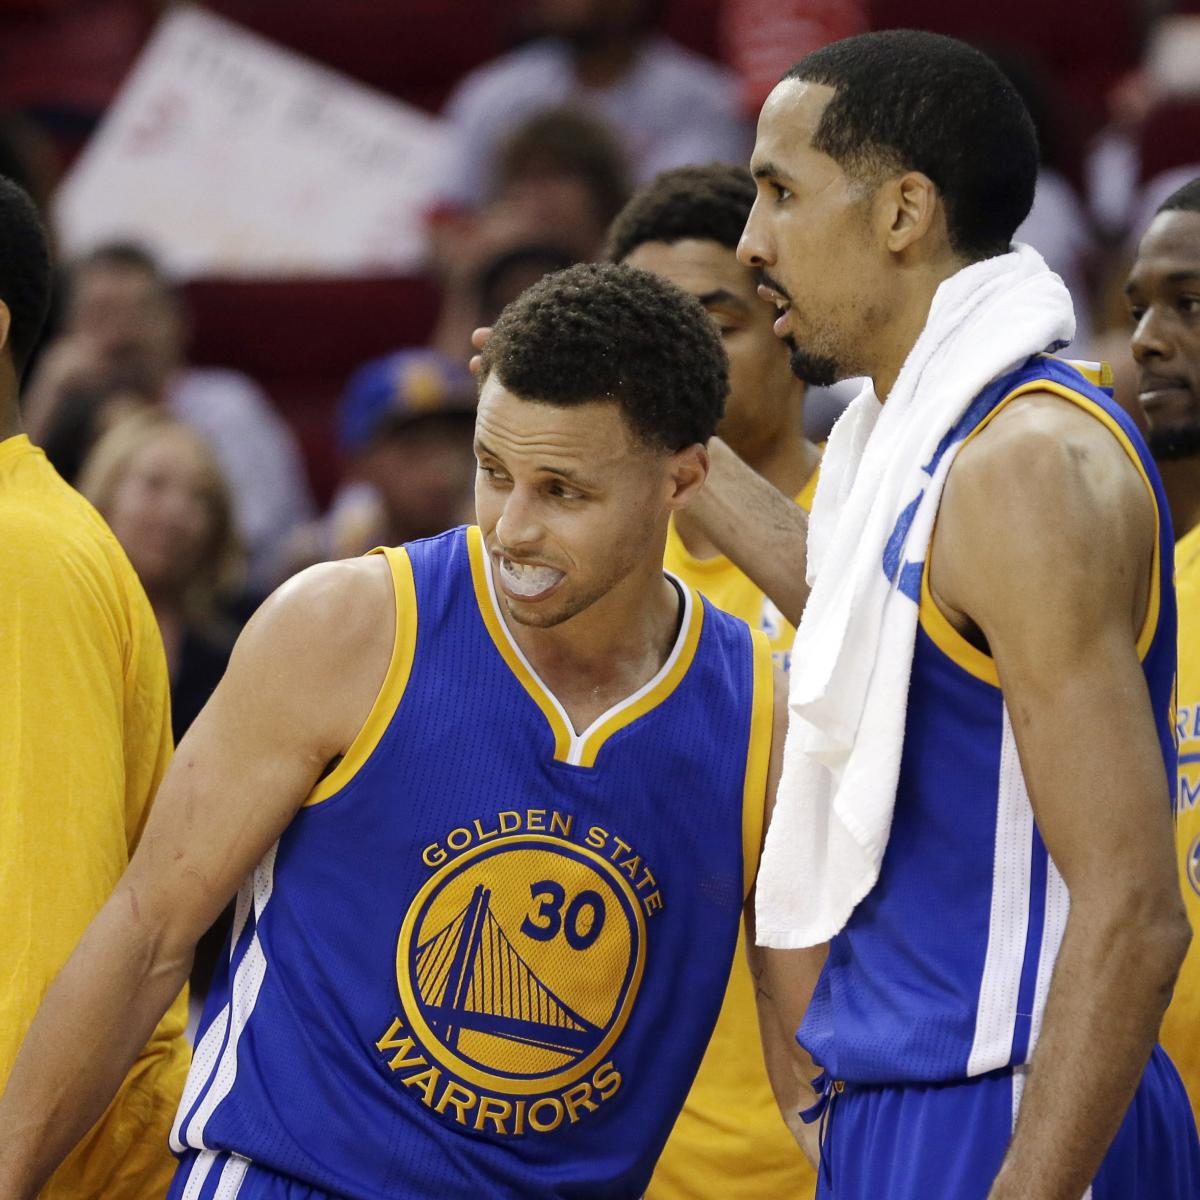 Rockets Vs Warriors Games: Golden State Warriors Vs. Houston Rockets: Game 4 Odds